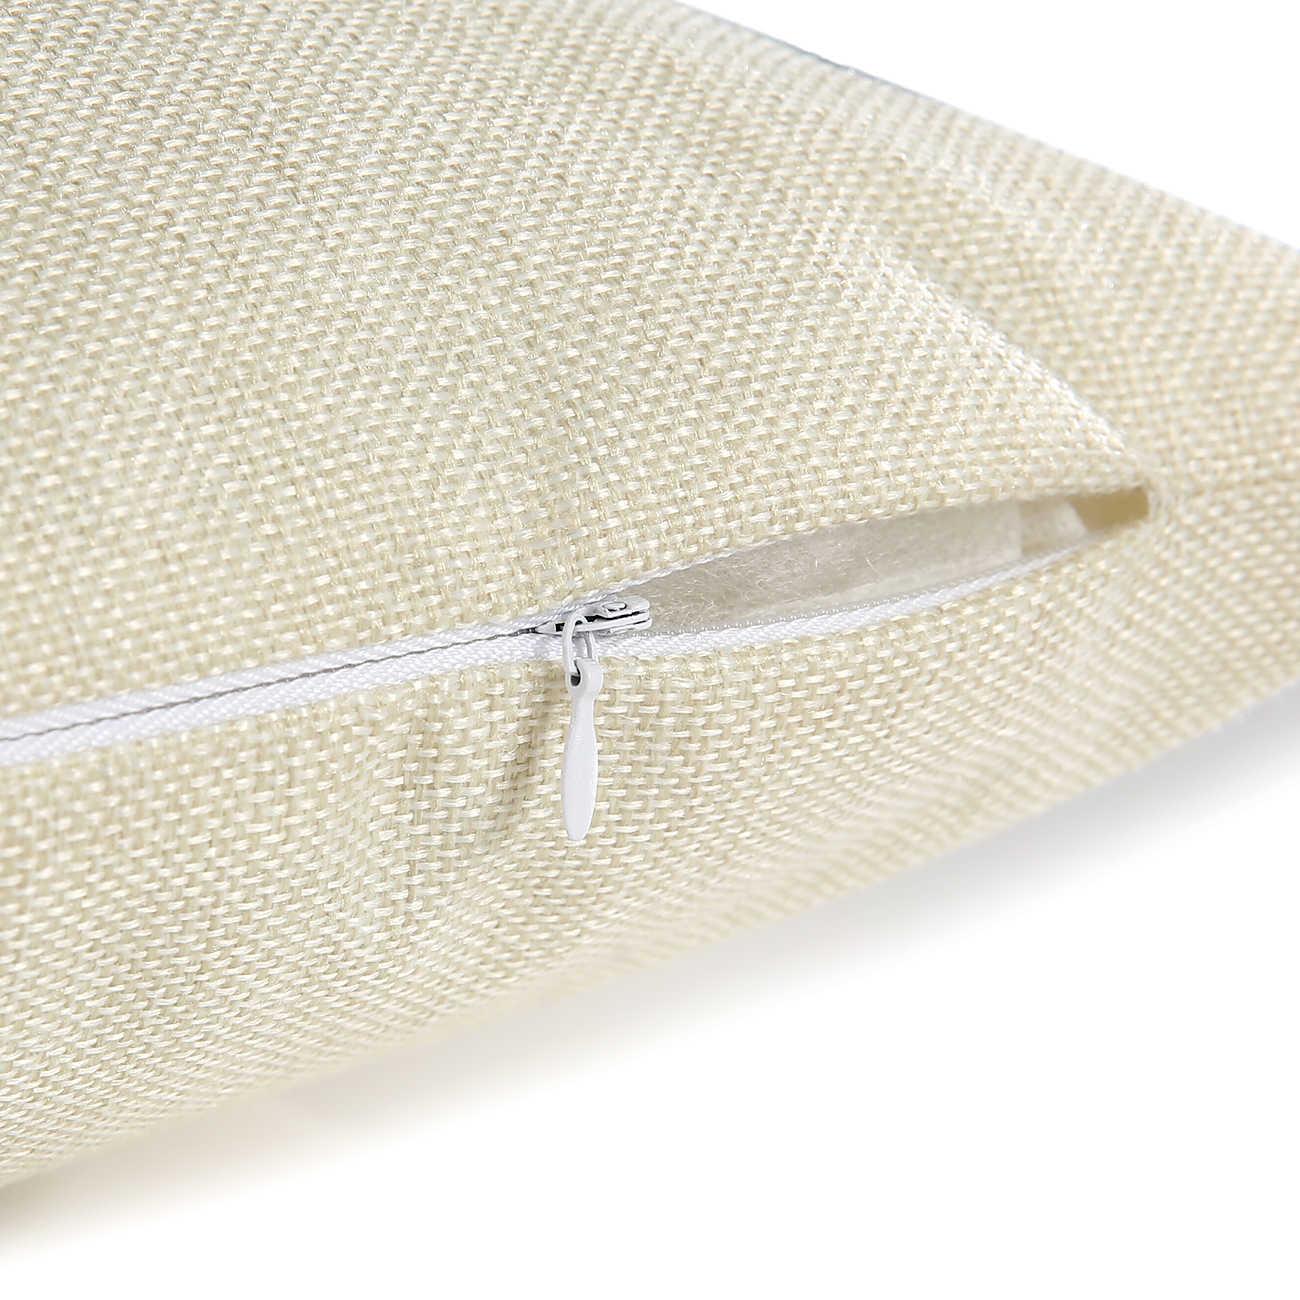 Wzh preto branco estilo moderno capa de almofada 45x45cm linho decorativo fronha sofá cama fronha